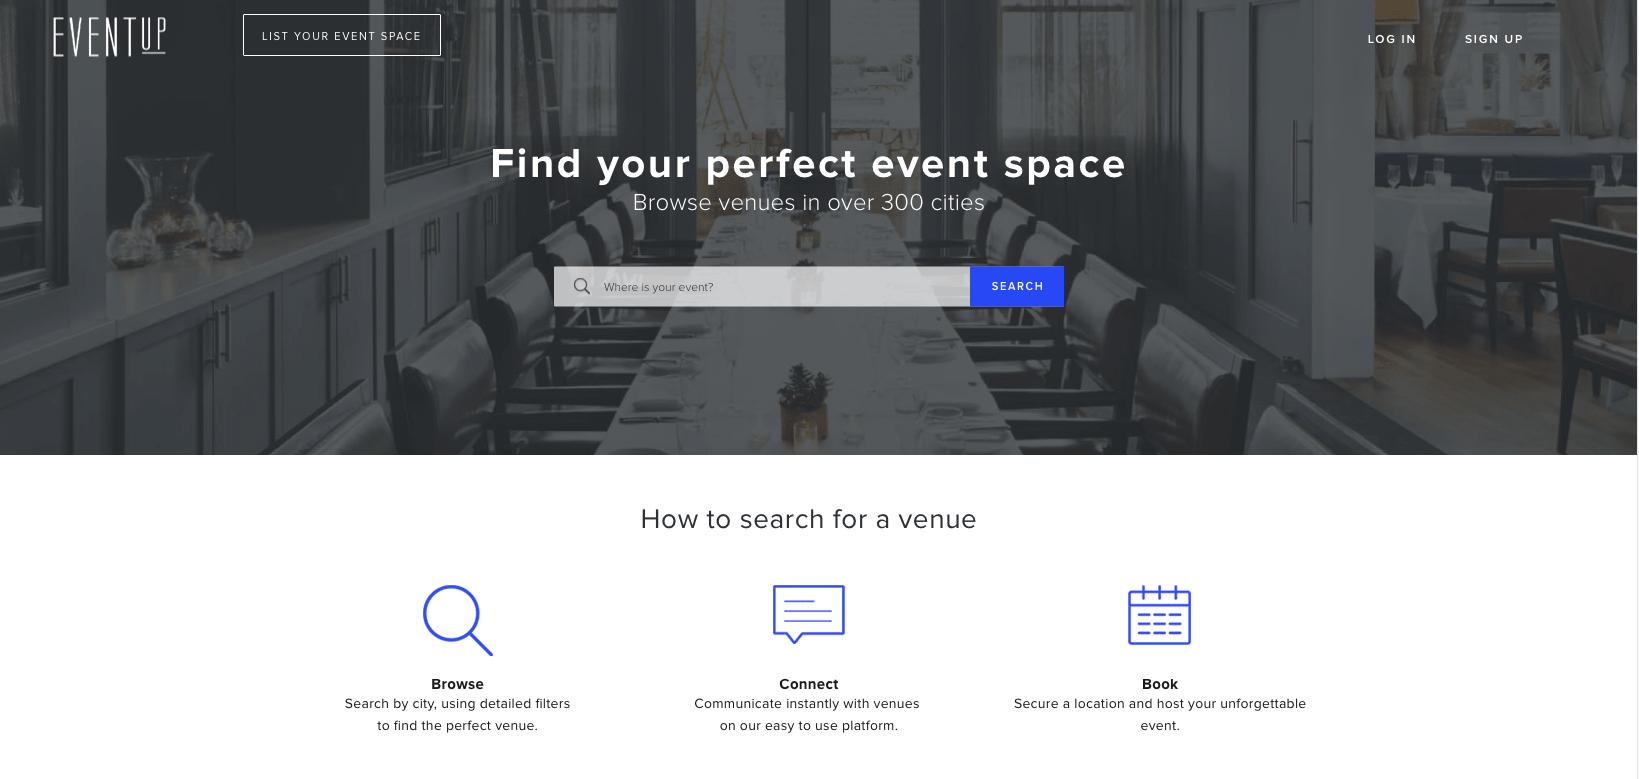 EVENTup Venue Spaces Search